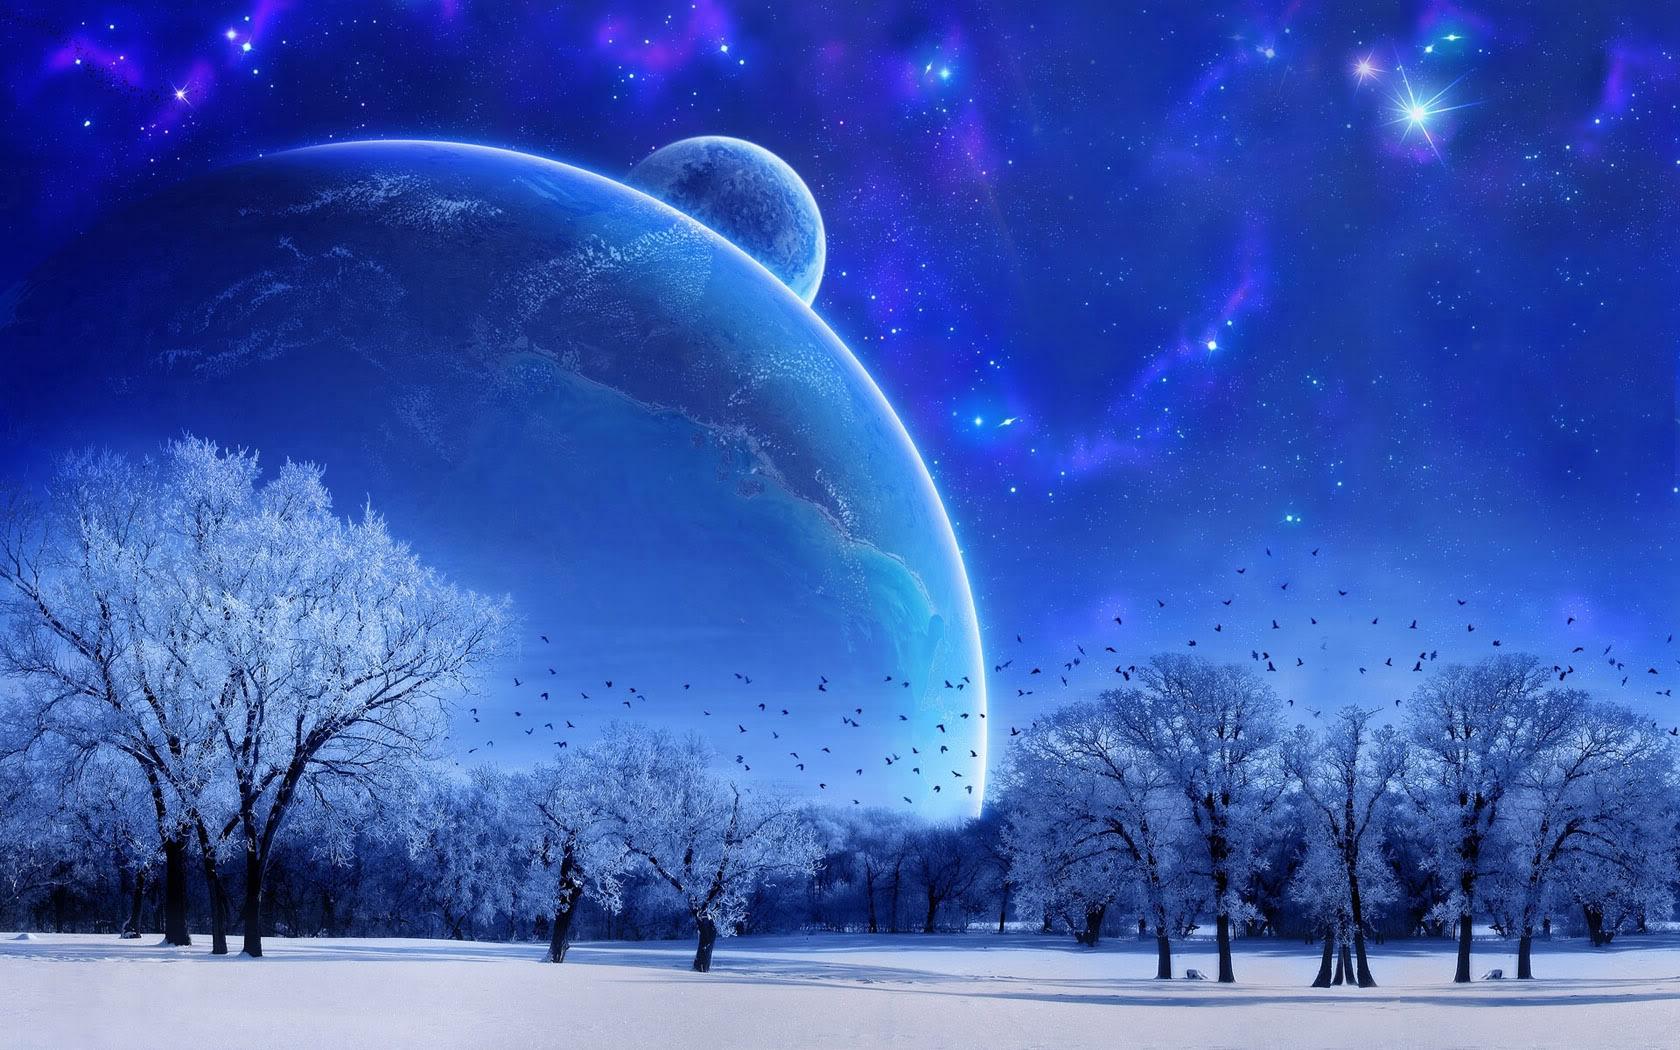 Wallpaper Nature Landscape Winter Sky Snow Full Moon